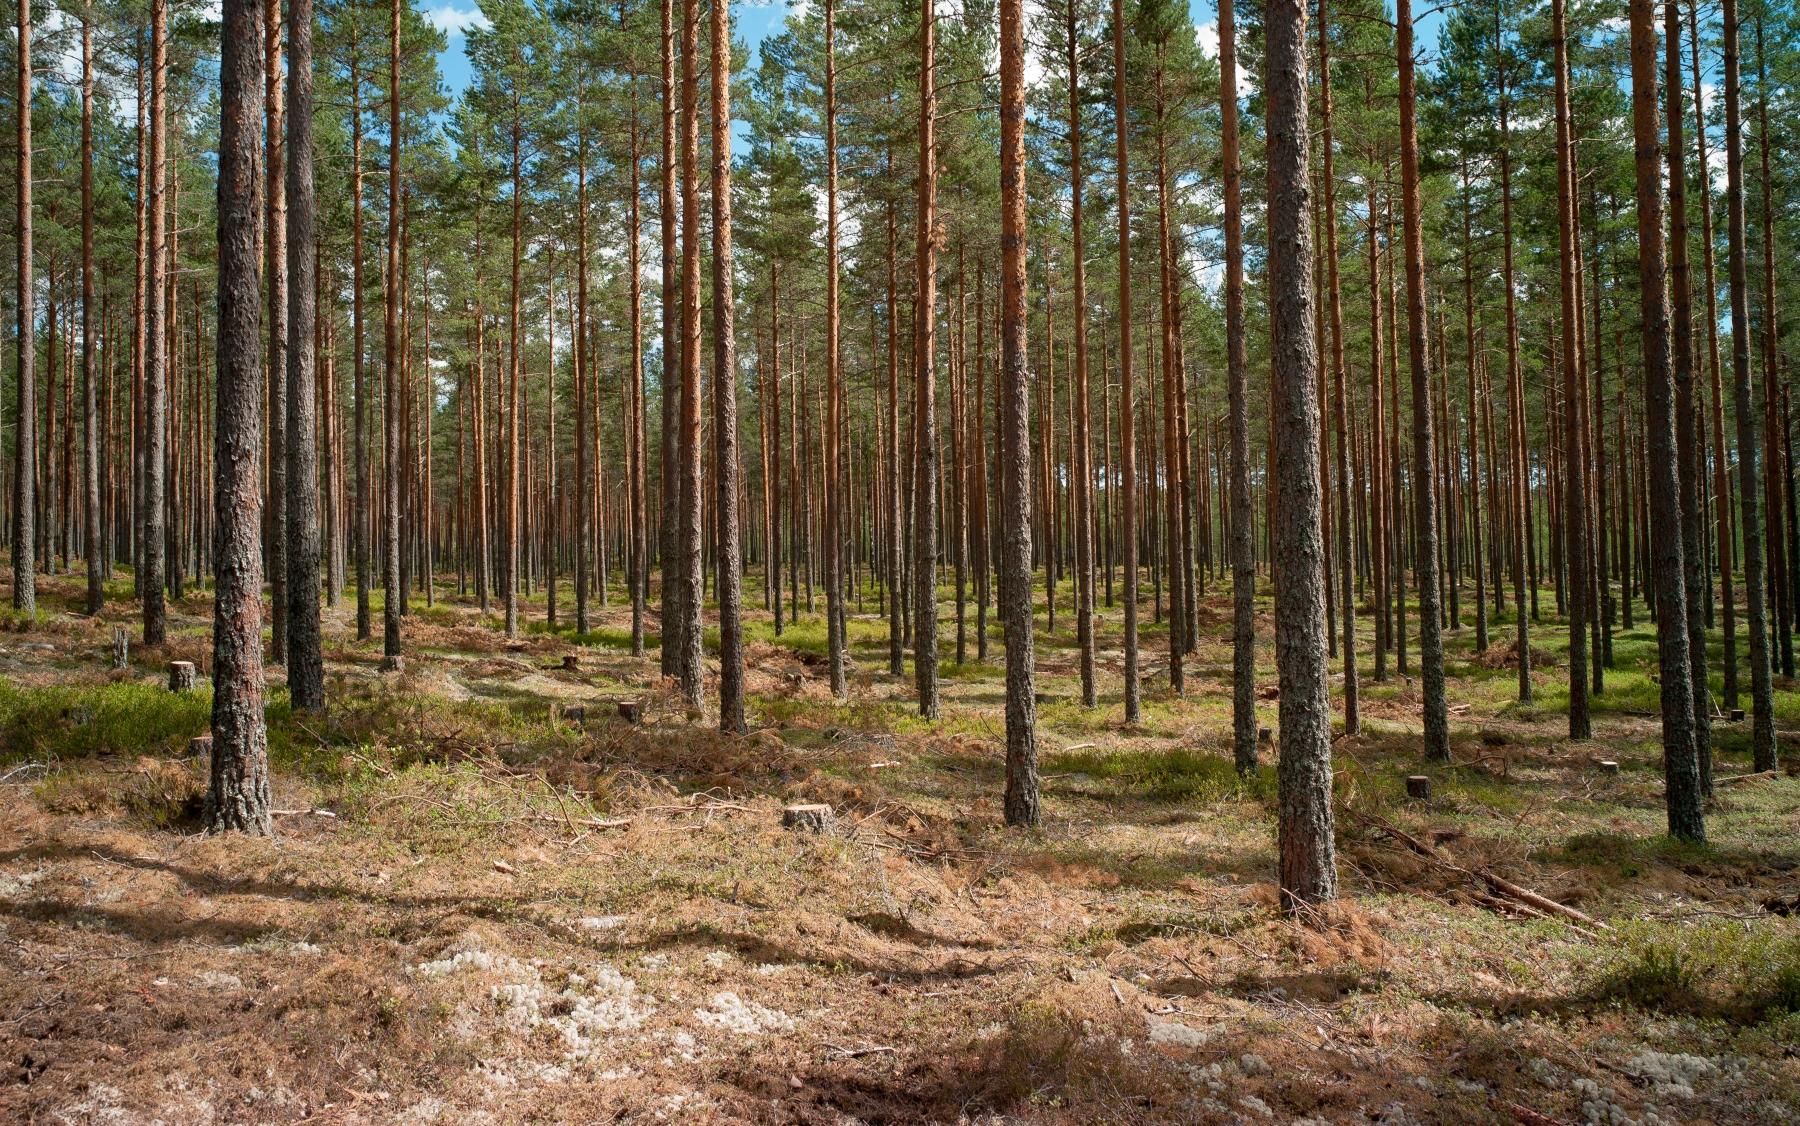 Sunnemo, Värmland